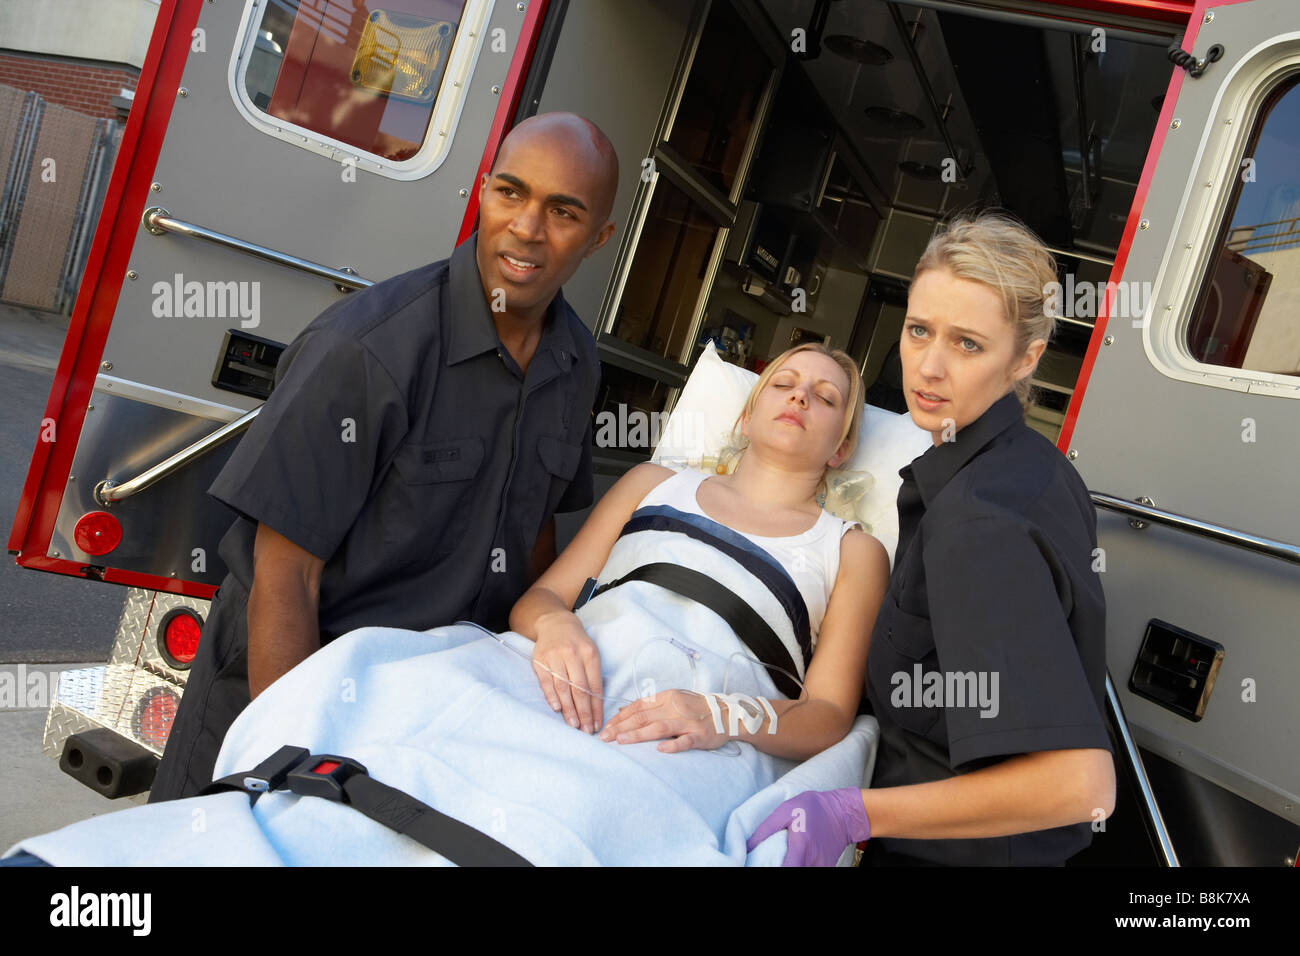 Paramedics unloading patient from ambulance - Stock Image